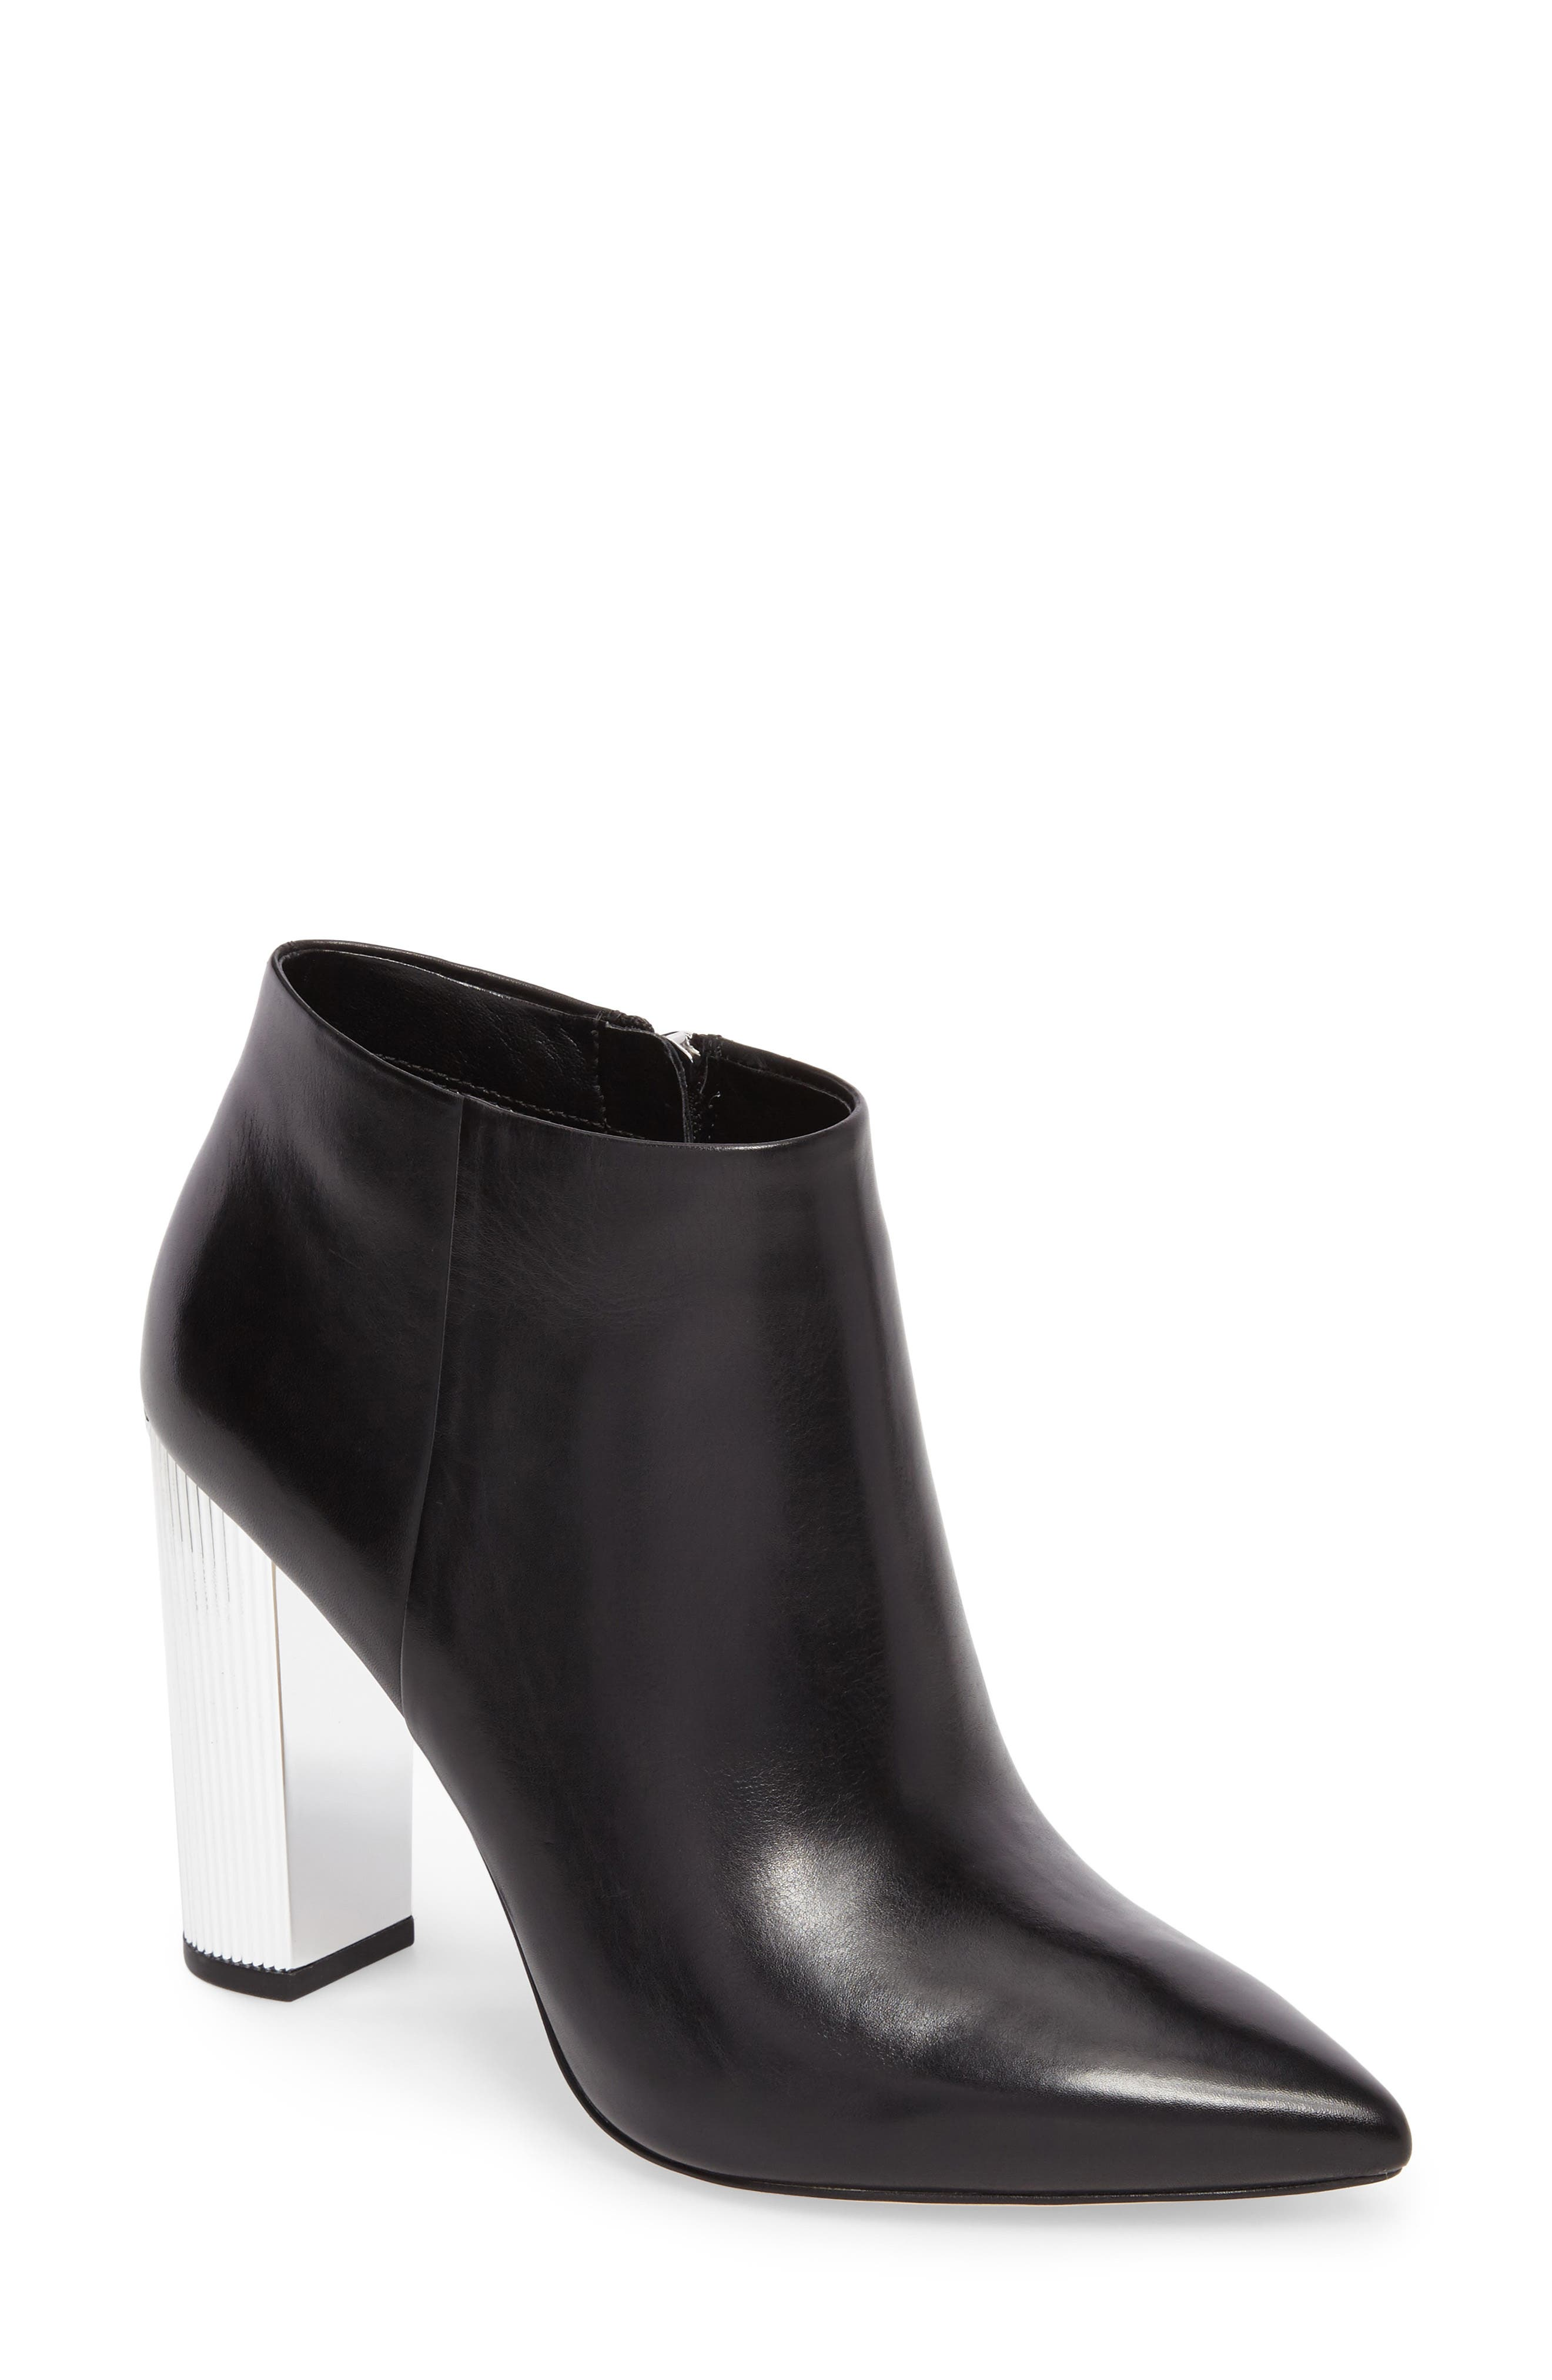 Paloma Bootie,                             Main thumbnail 1, color,                             Black Calf Leather